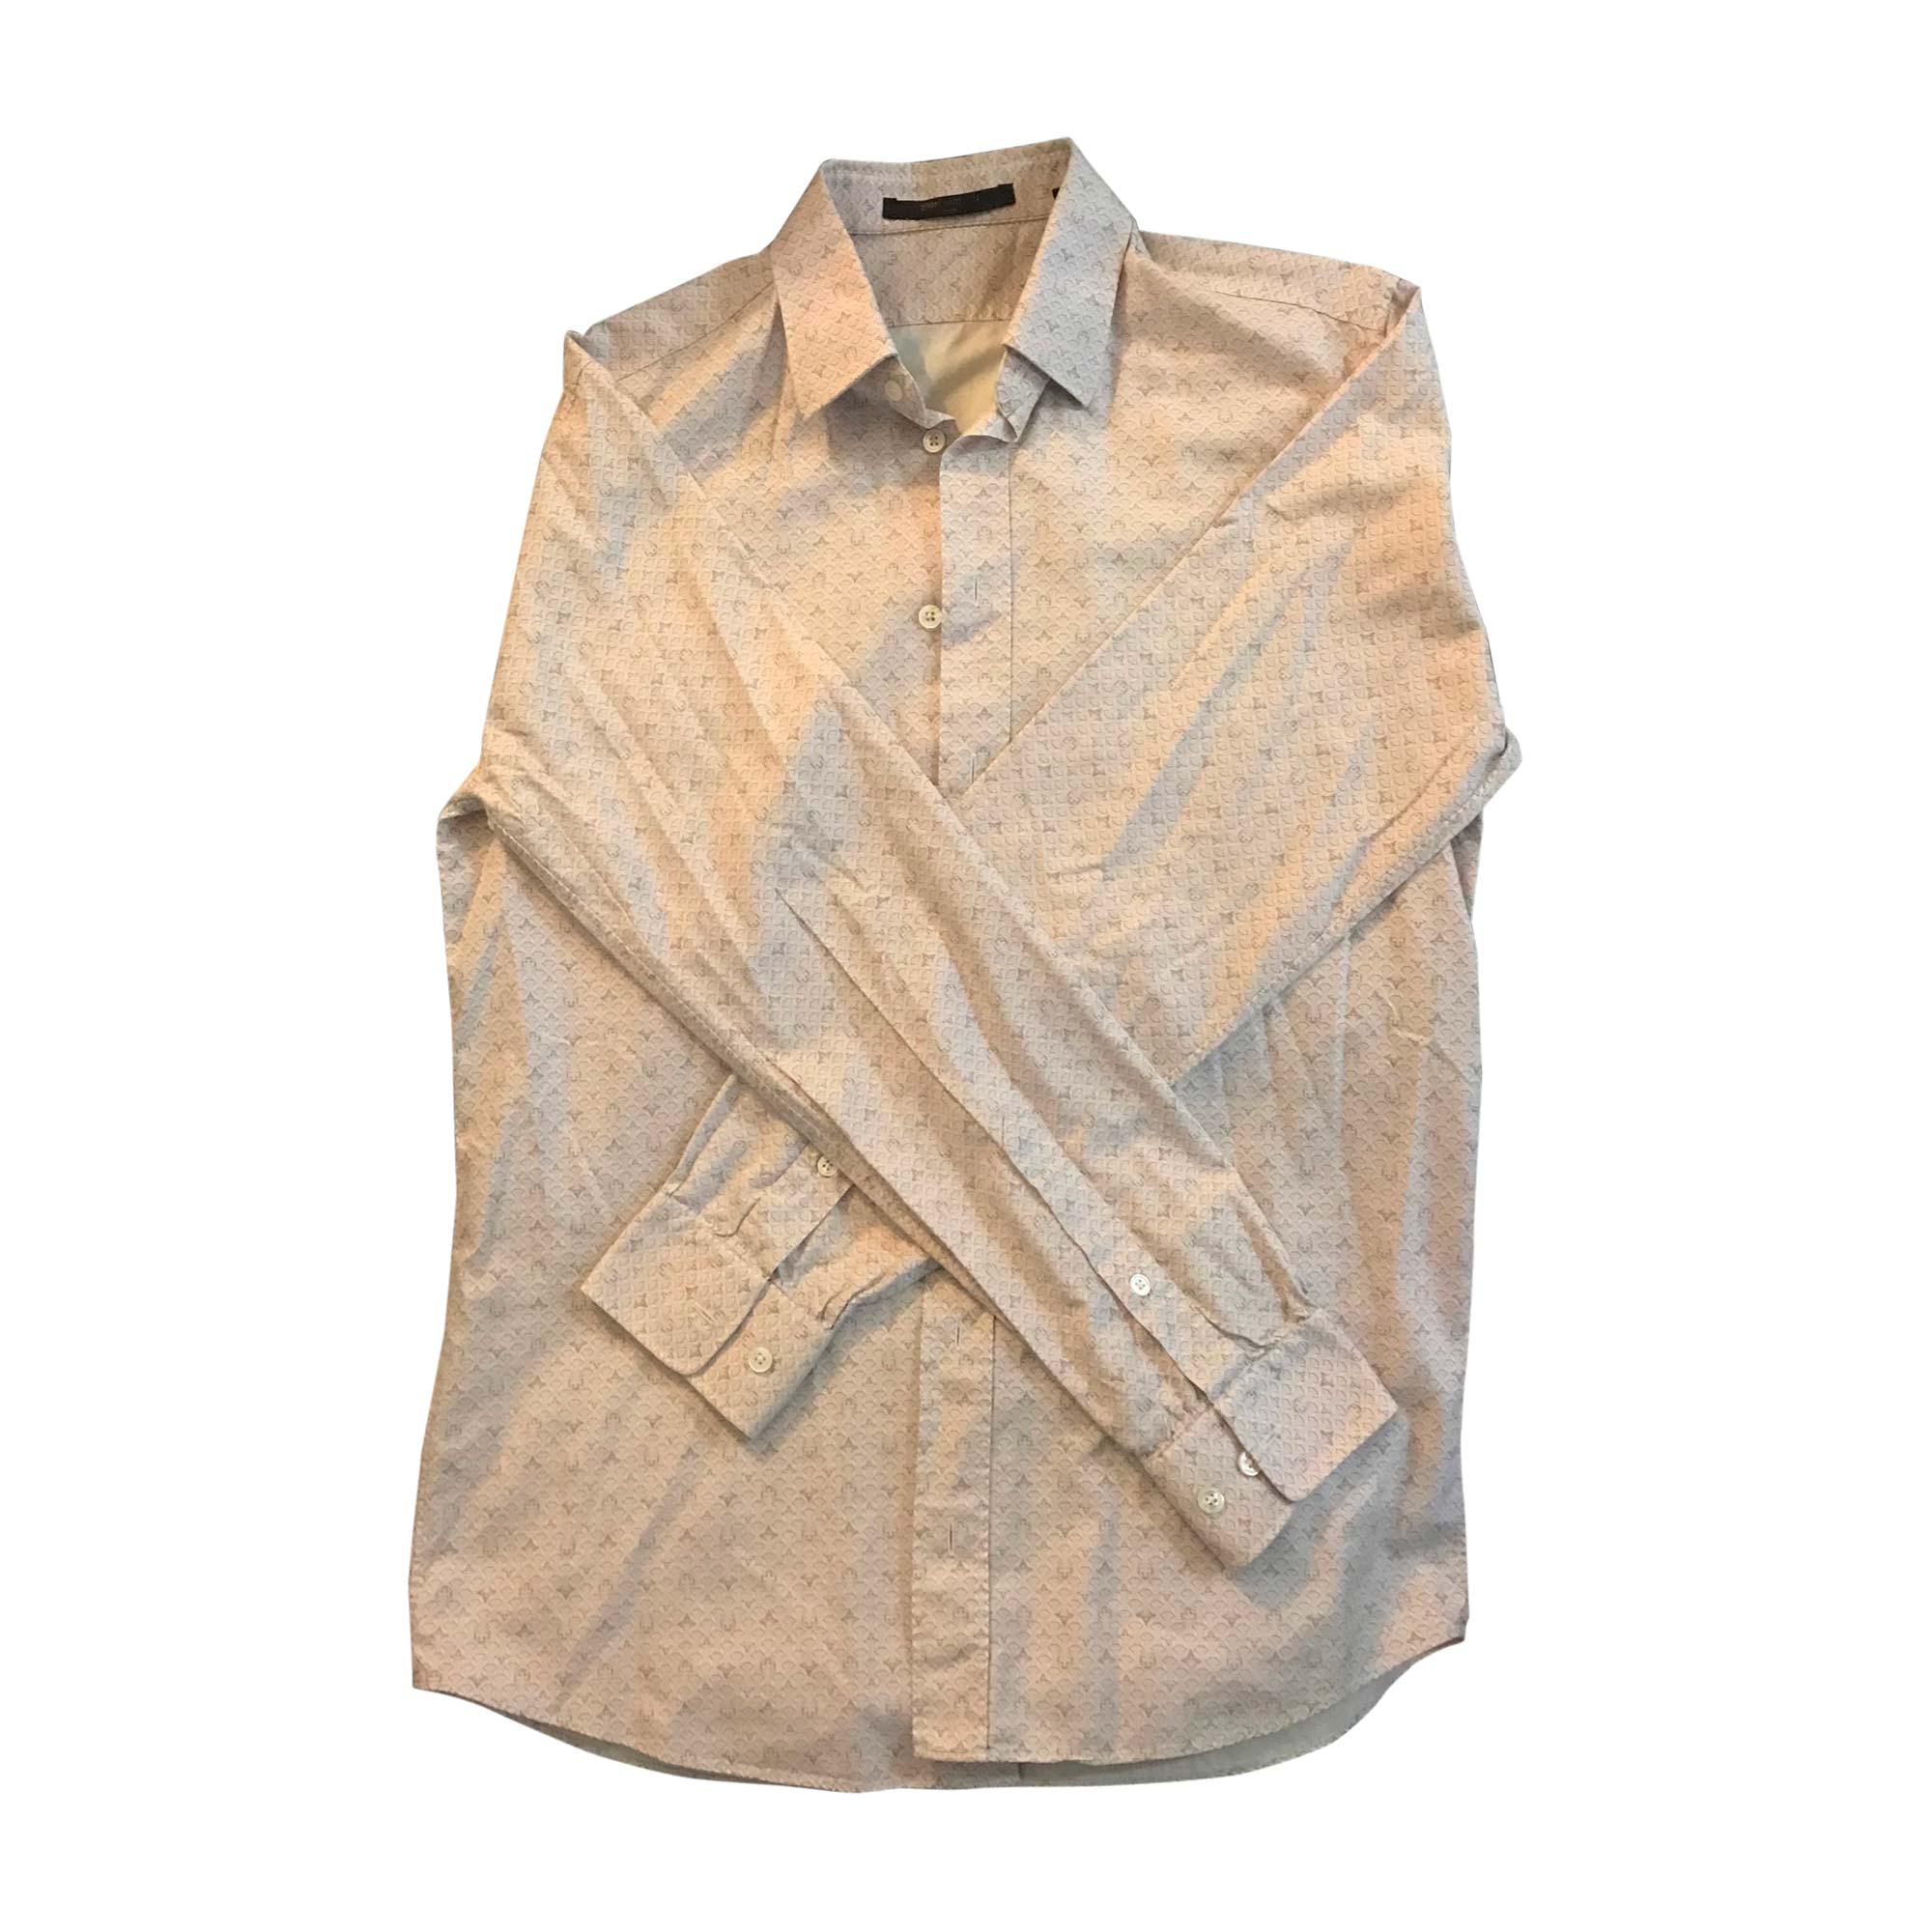 Camicia LOUIS VUITTON Rosa, fucsia, rosa antico